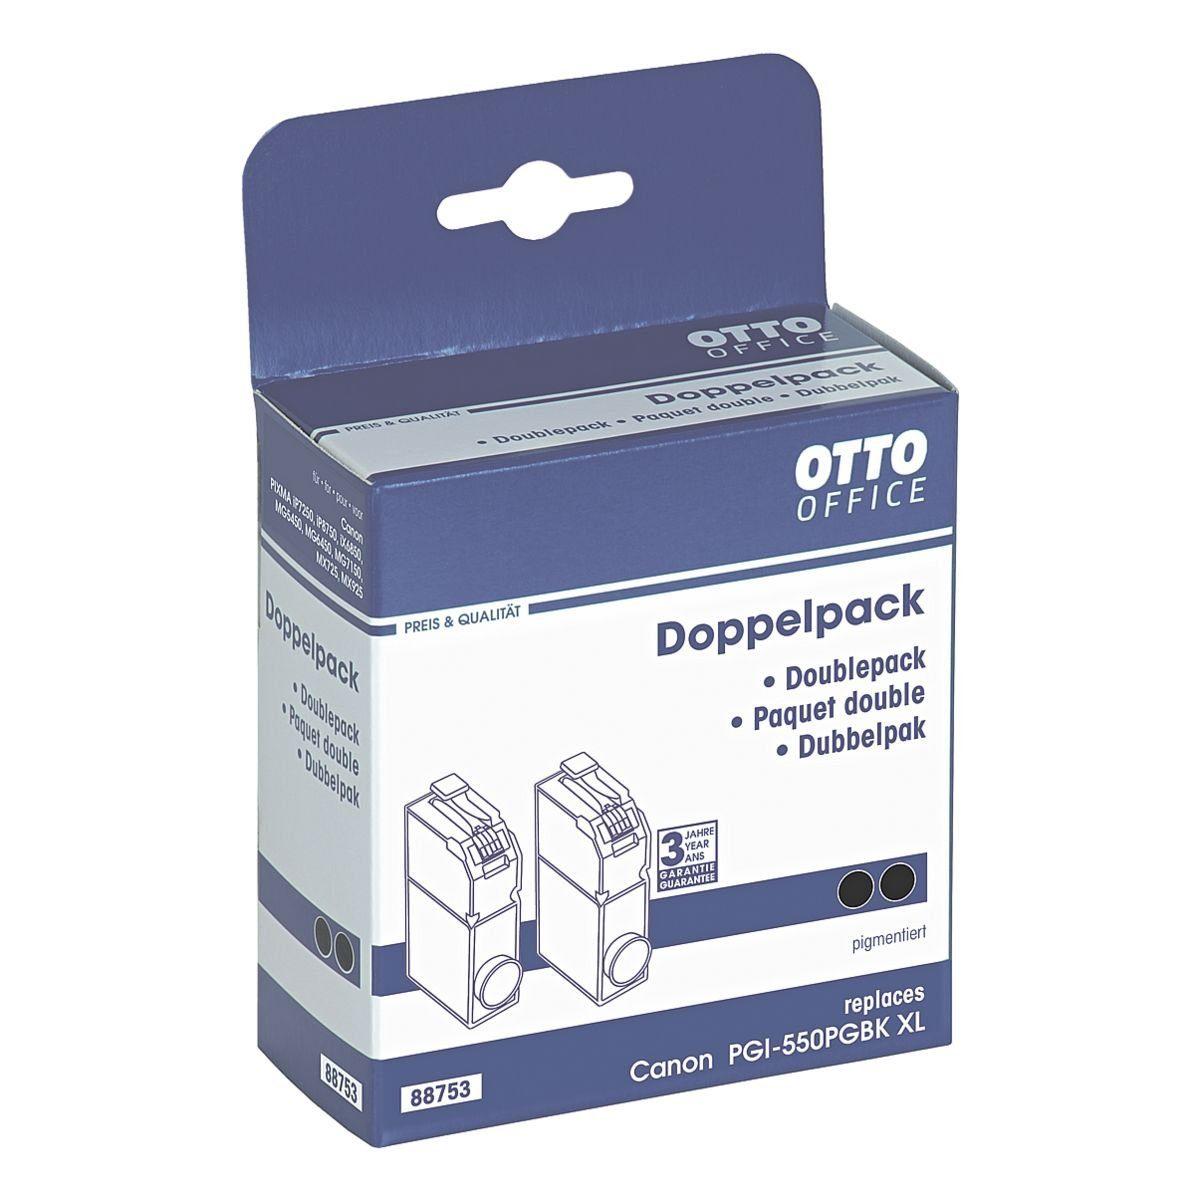 OTTO Office Standard Doppelpack Tintenpatrone ersetzt Canon »PGI-550 PGBK XL...